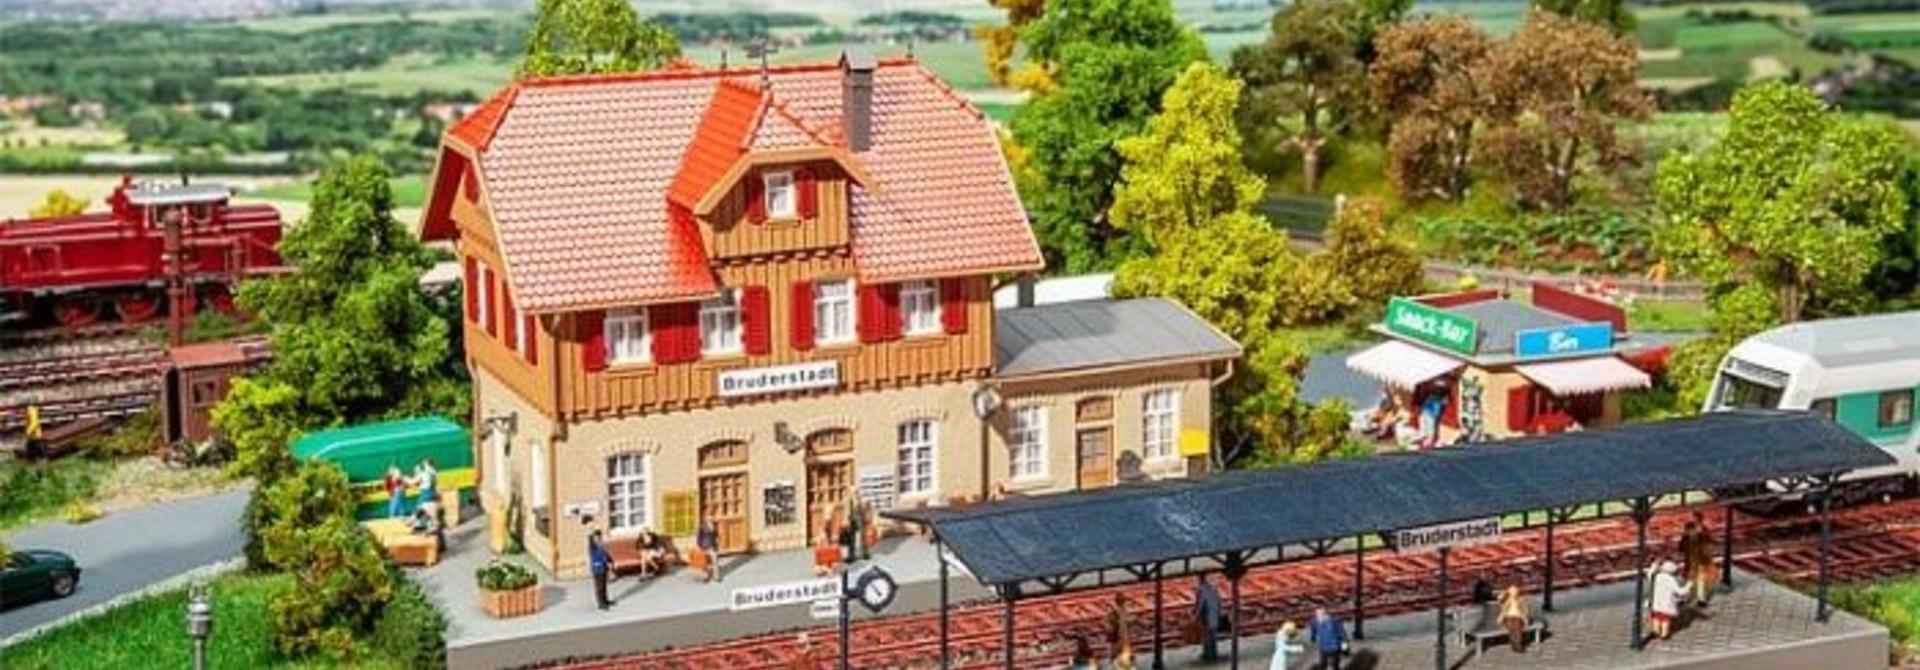 190072 Actieset station en omgeving